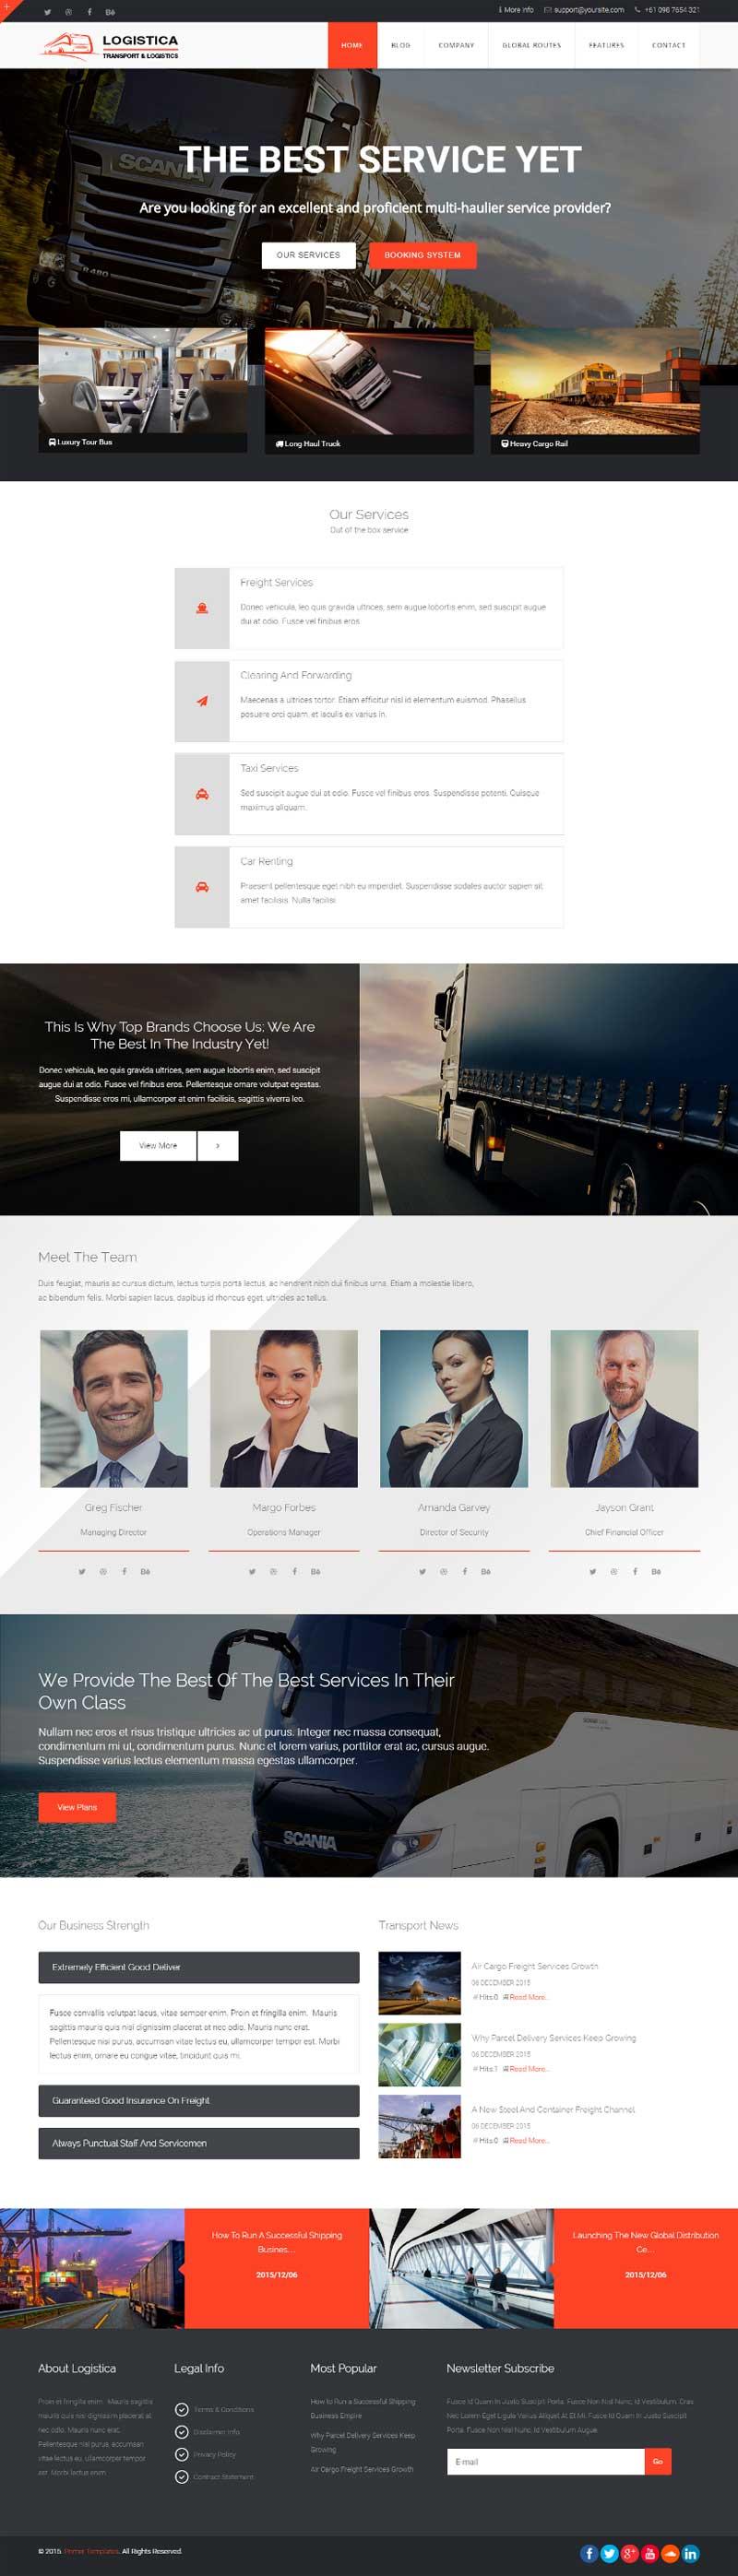 Logistics Joomla! template